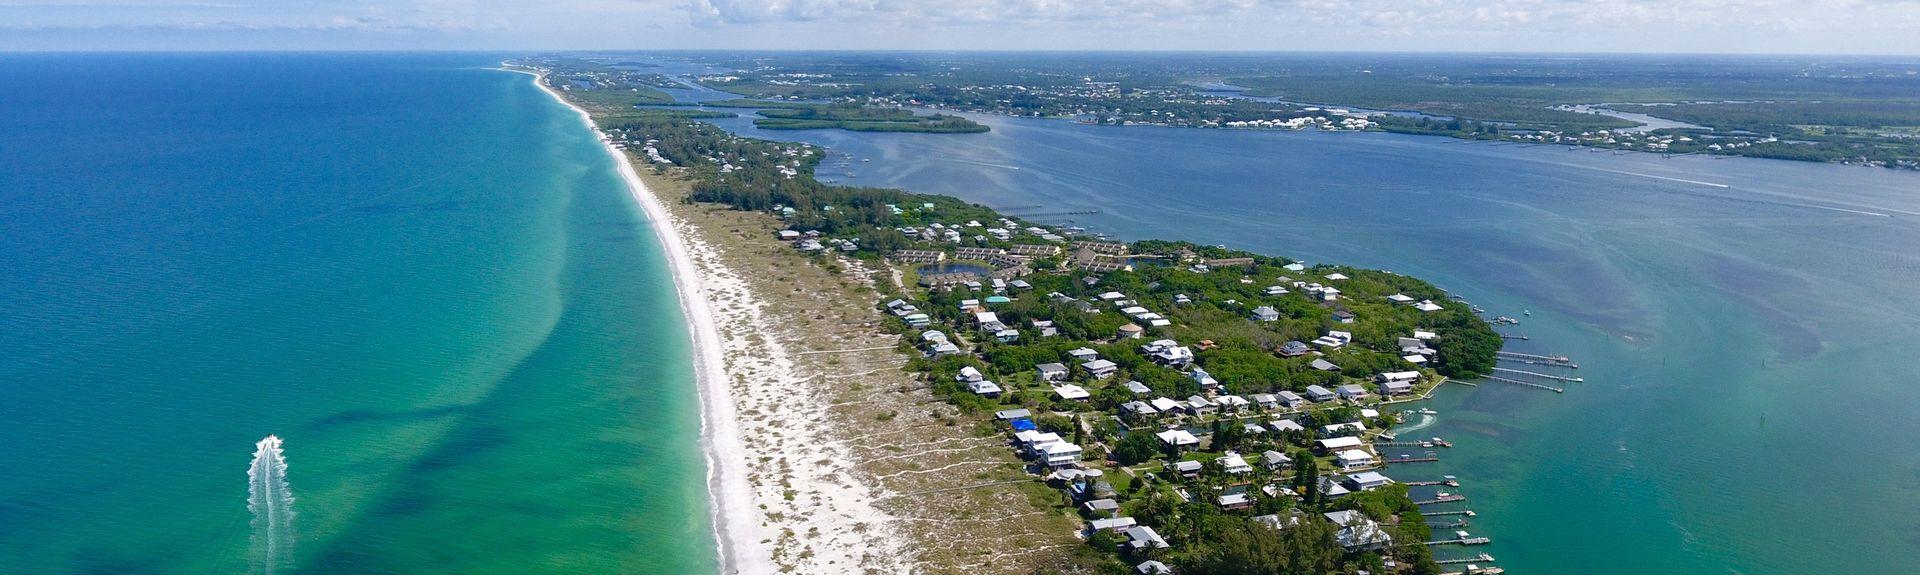 Grove City, Florida, Vereinigte Staaten